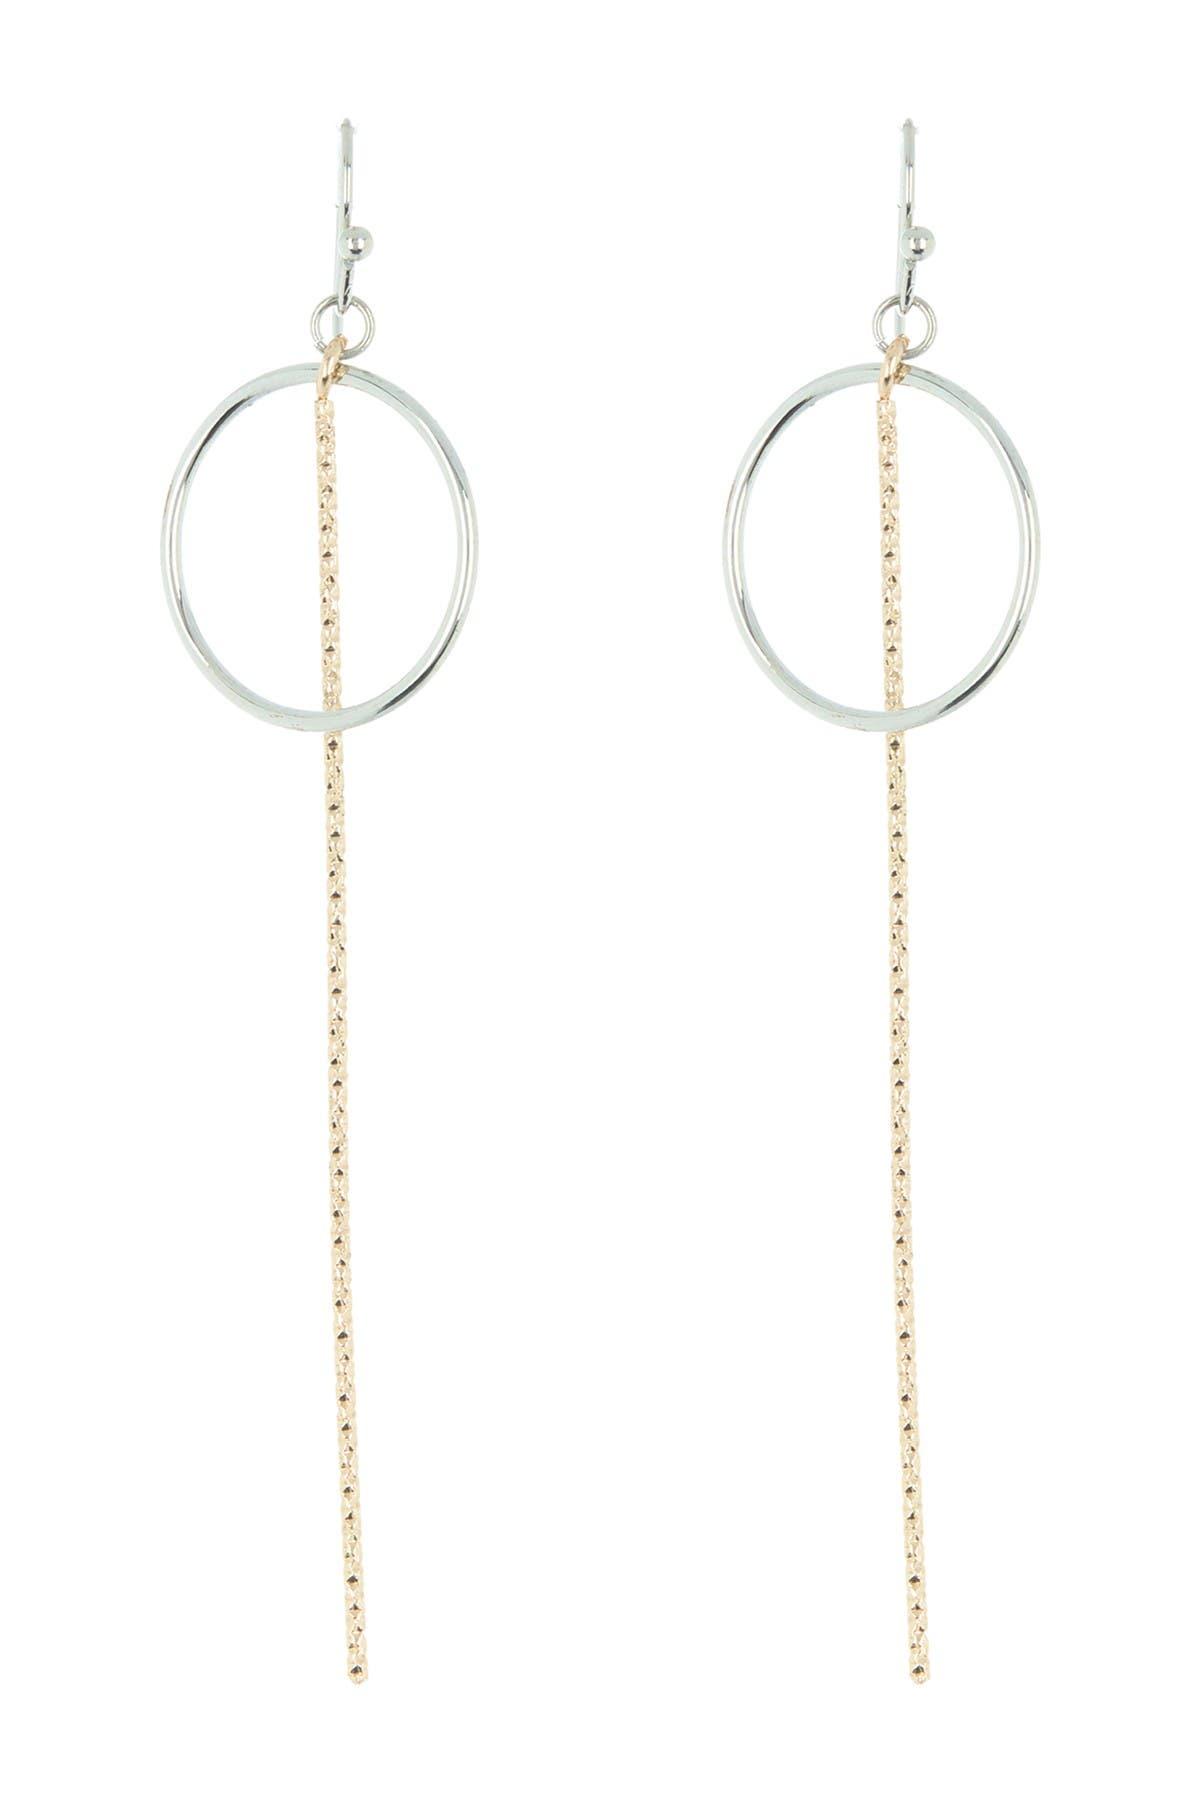 Image of AREA STARS Two-Tone Circular Link Fringe Drop Earrings